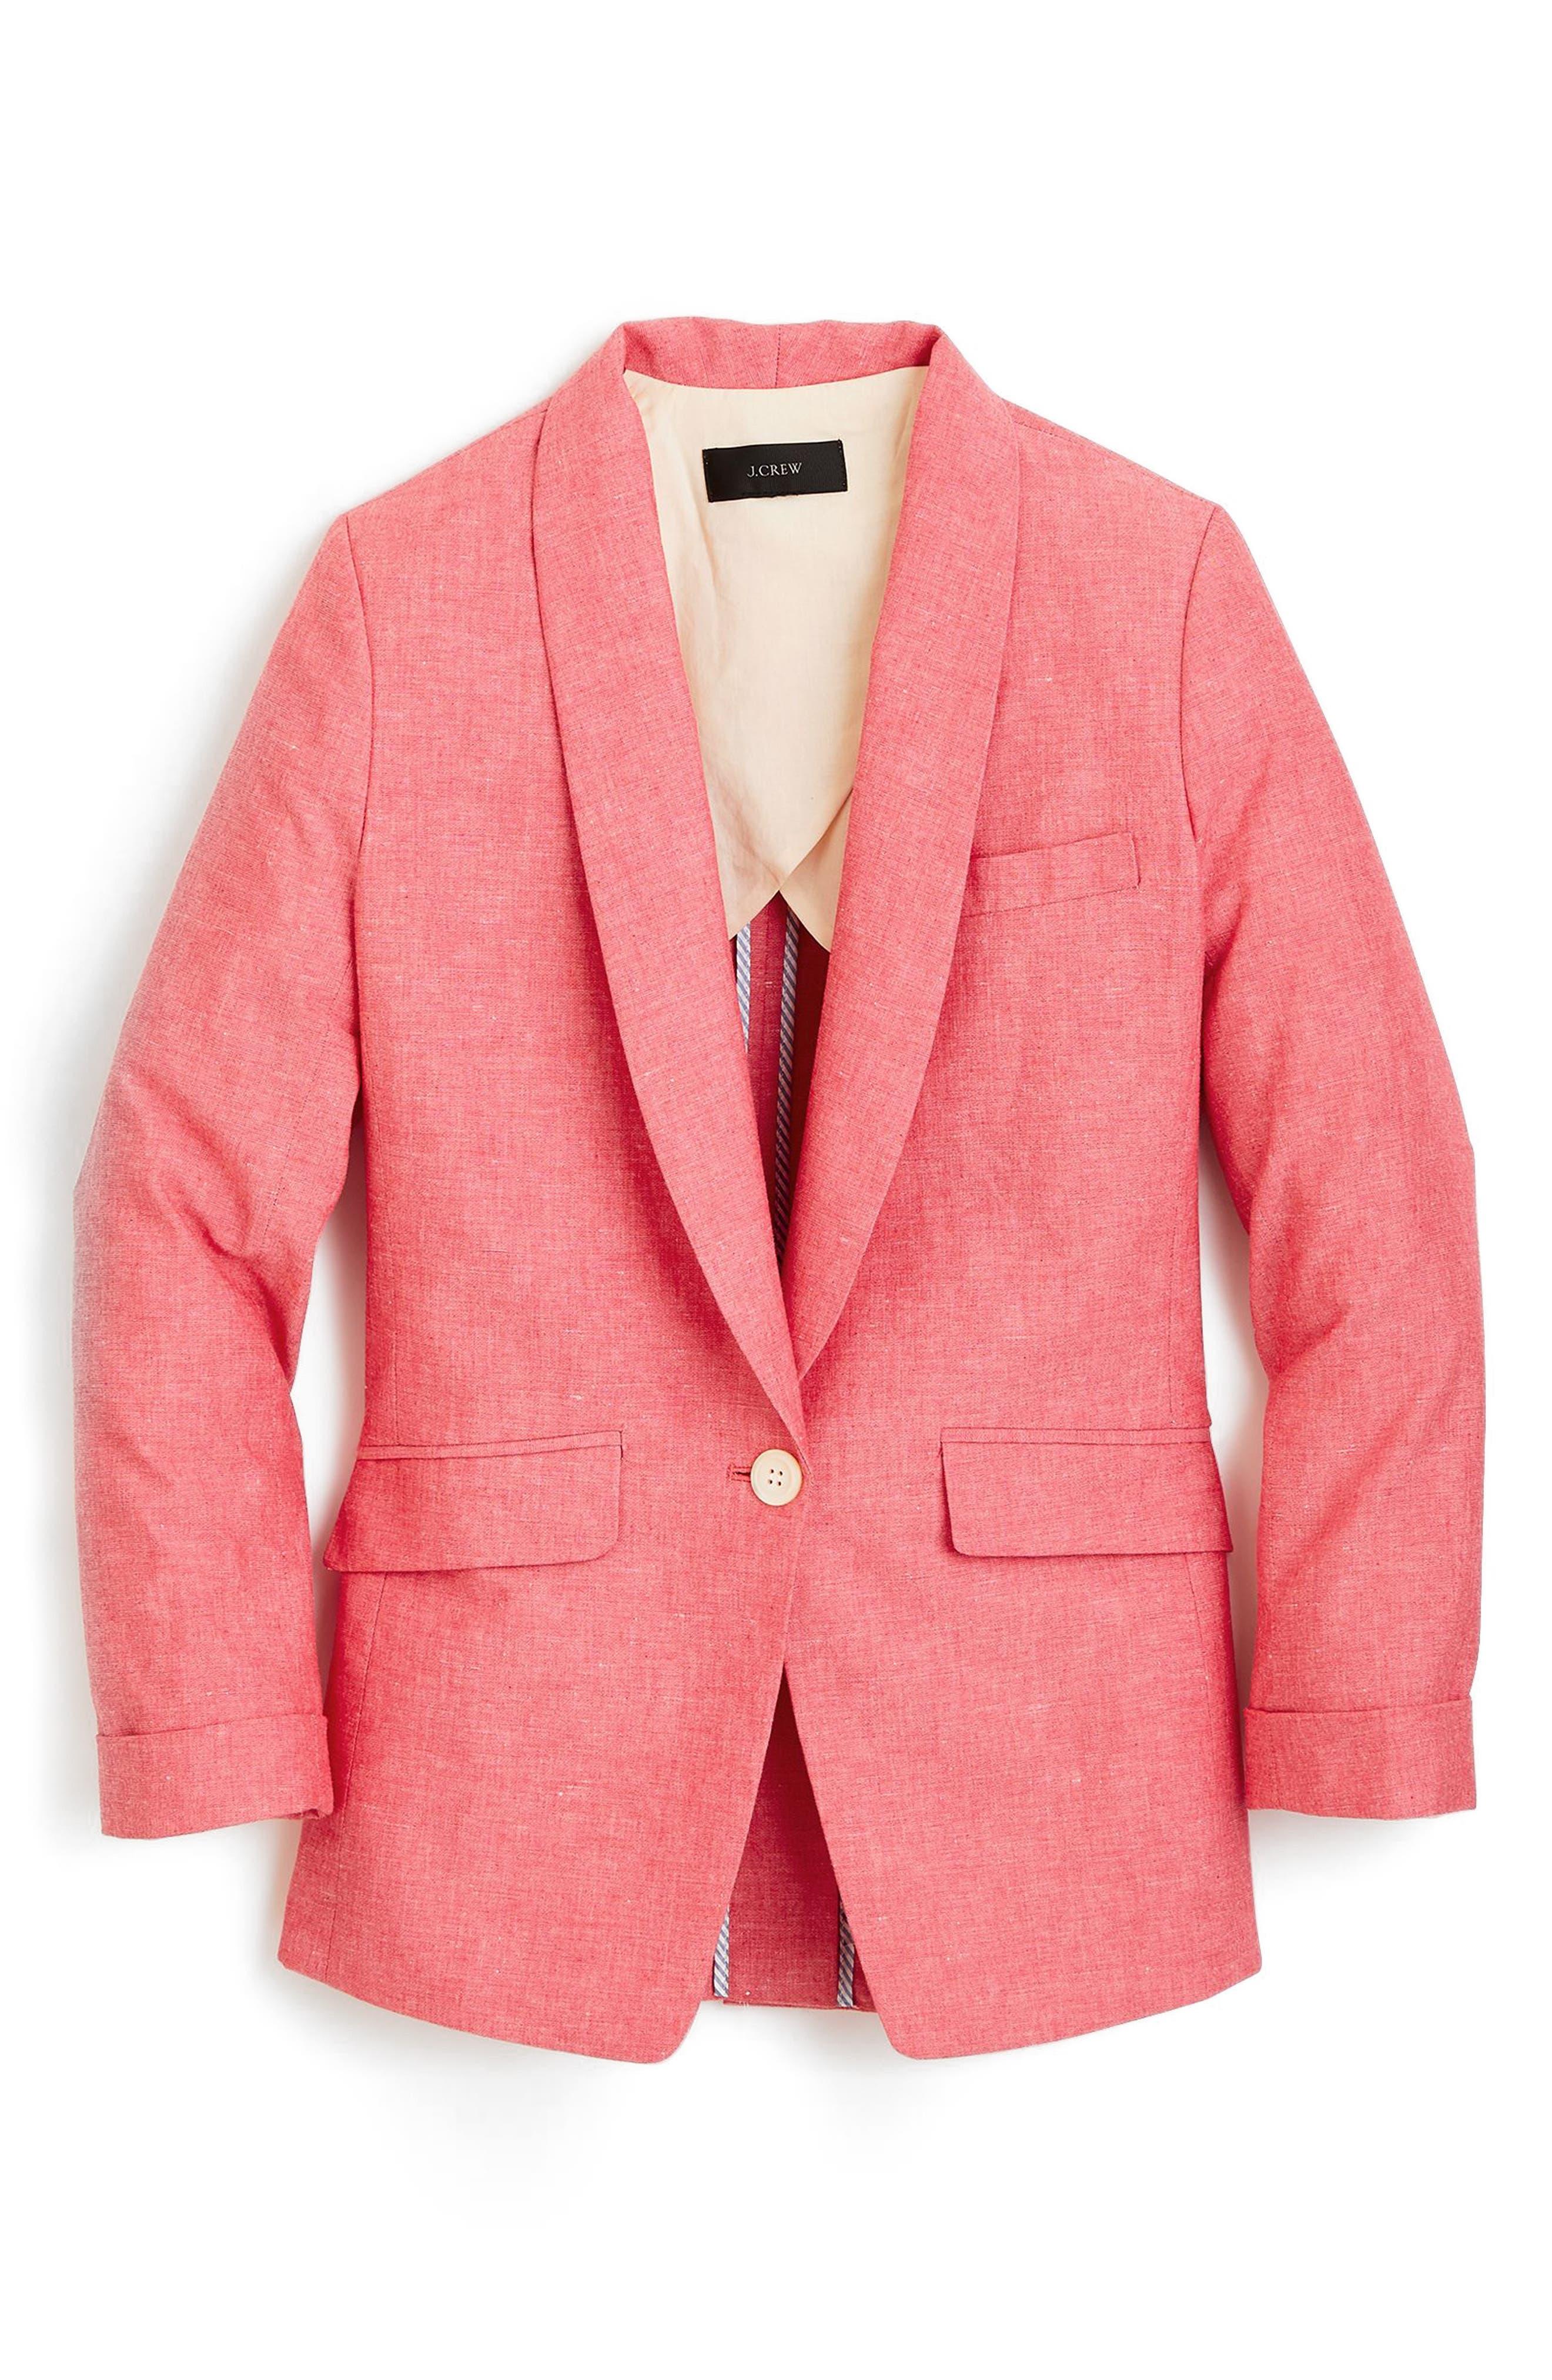 J.Crew Unstructured Shawl Collar Cotton Linen Blazer,                             Main thumbnail 1, color,                             Firecracker Red